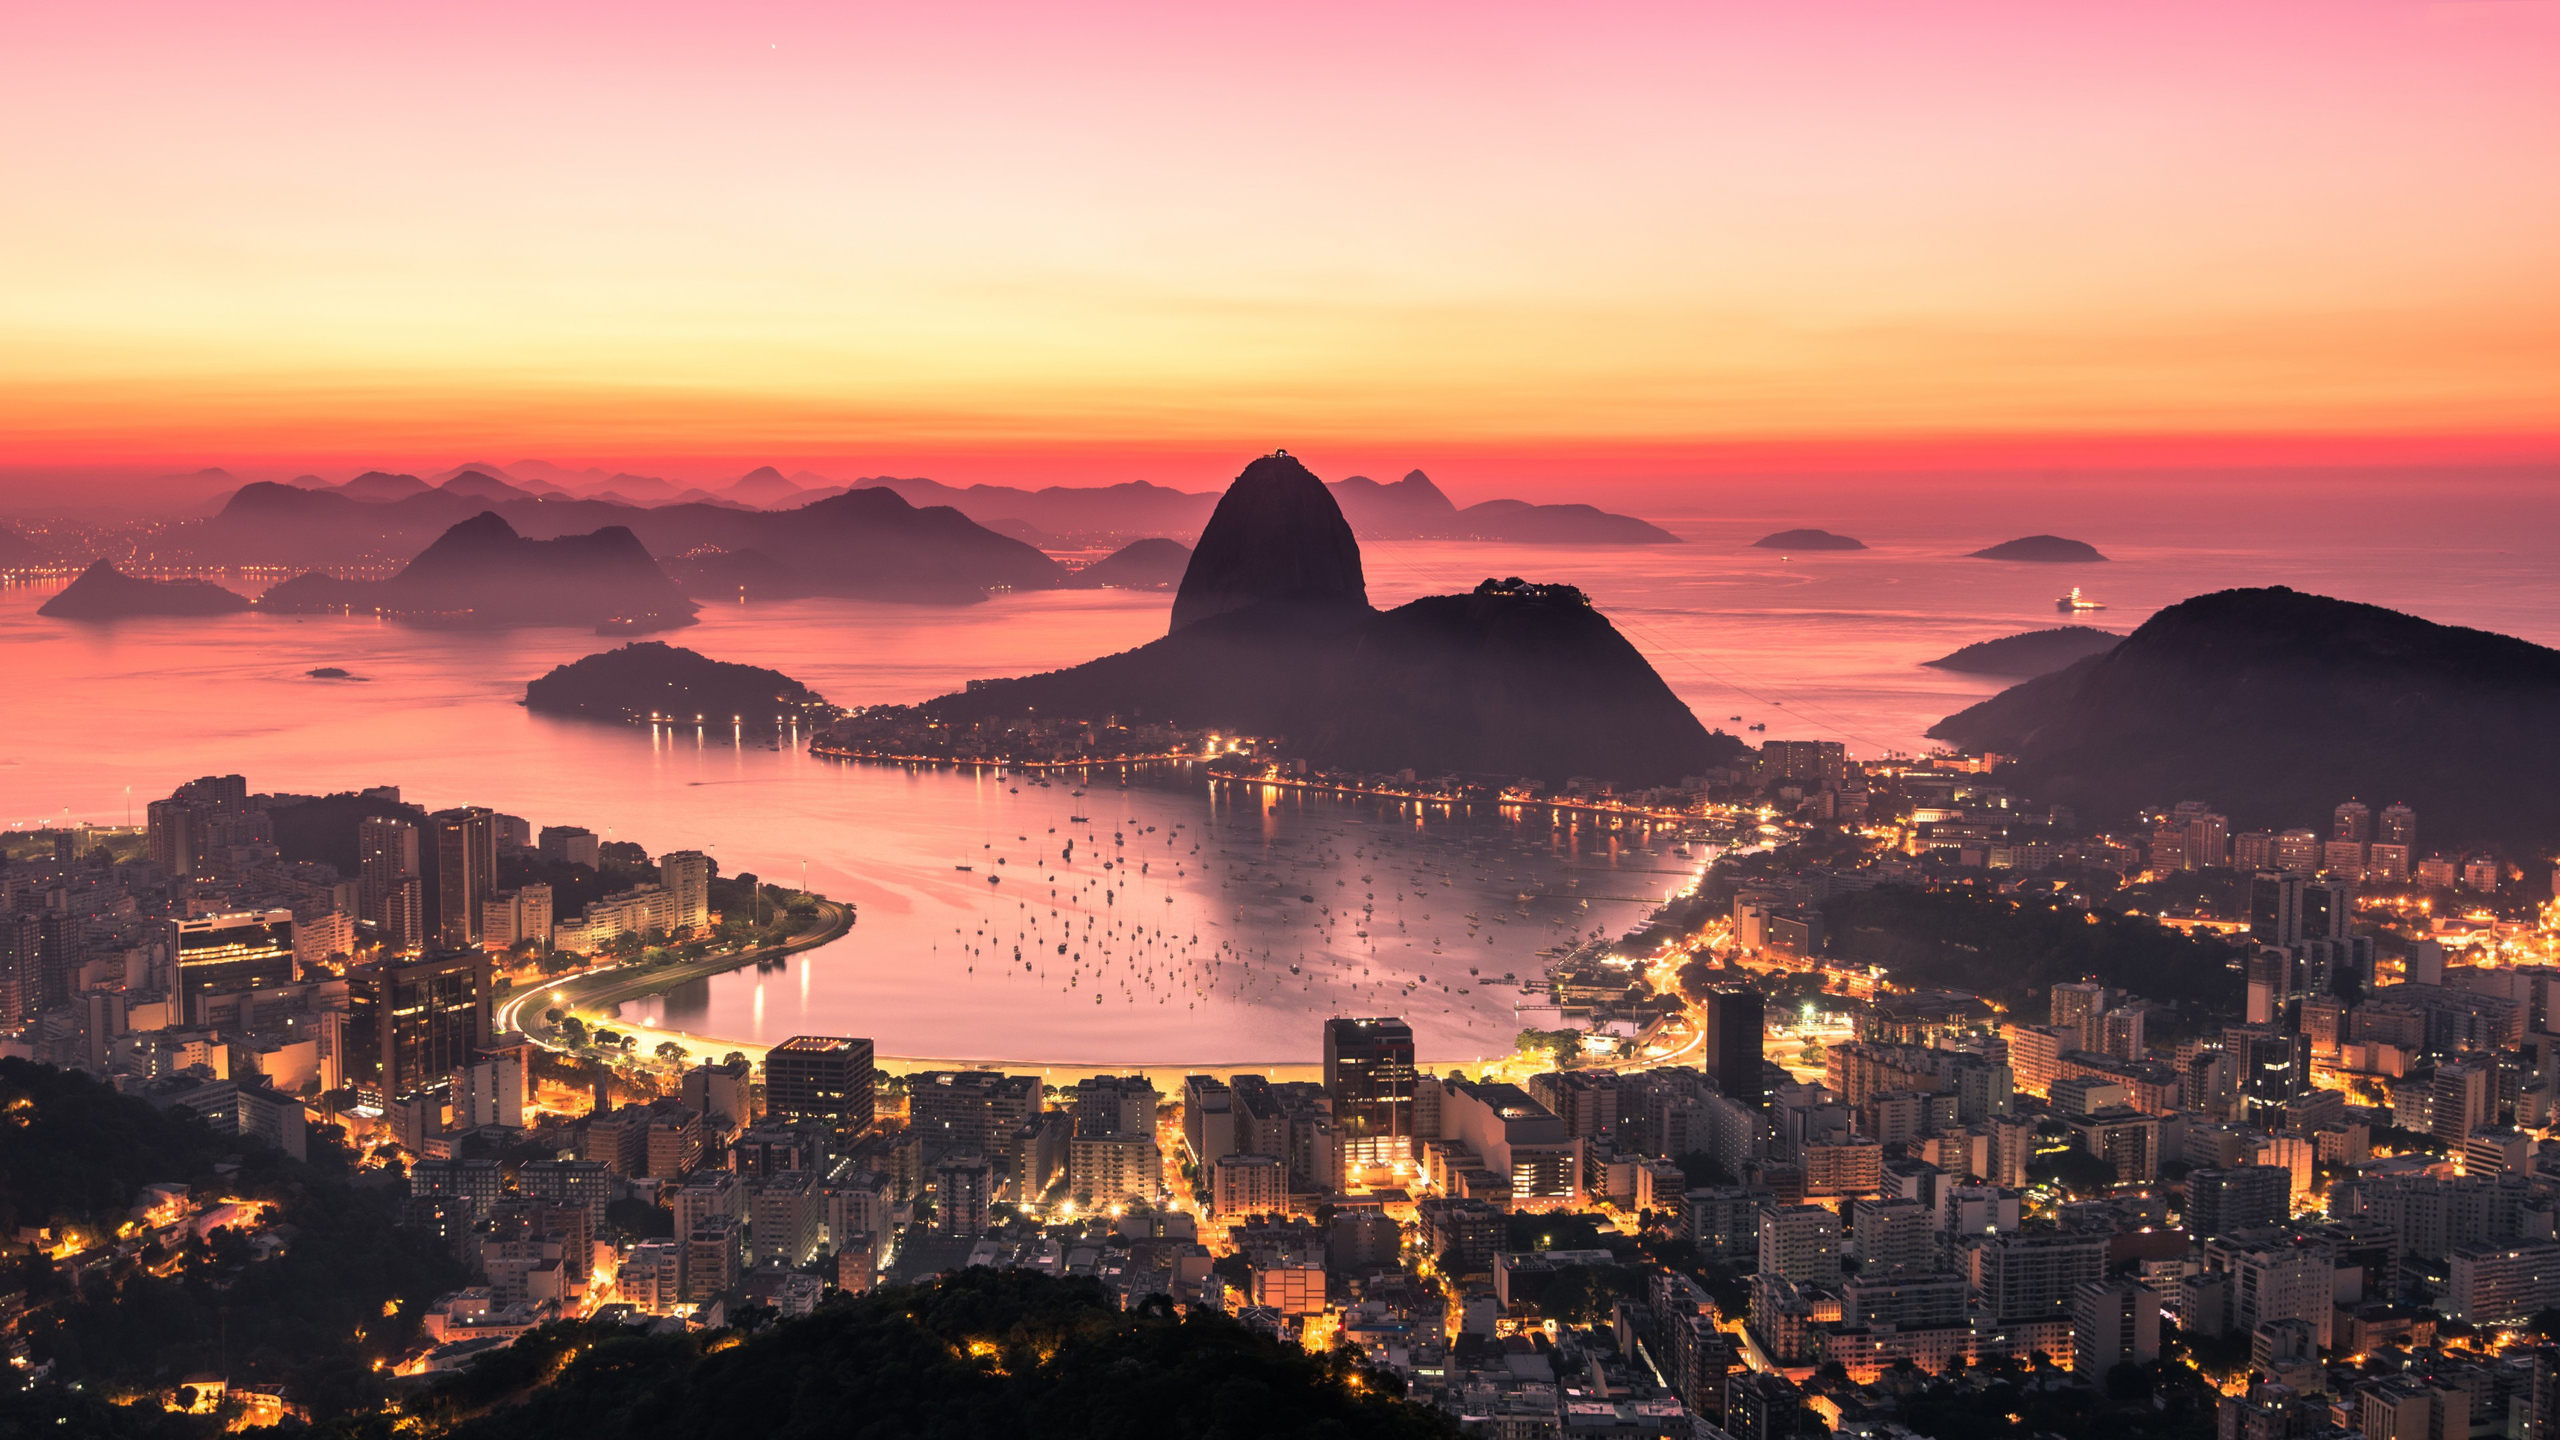 2560x1440 Rio De Janeiro Sunrise 4k 1440p Resolution Hd 4k